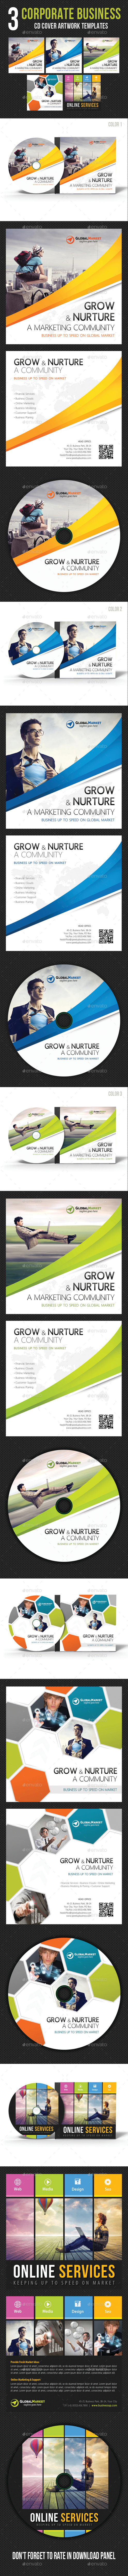 3 in 1 Corporate Business CD Cover Artwork Bundle - CD & DVD Artwork Print Templates